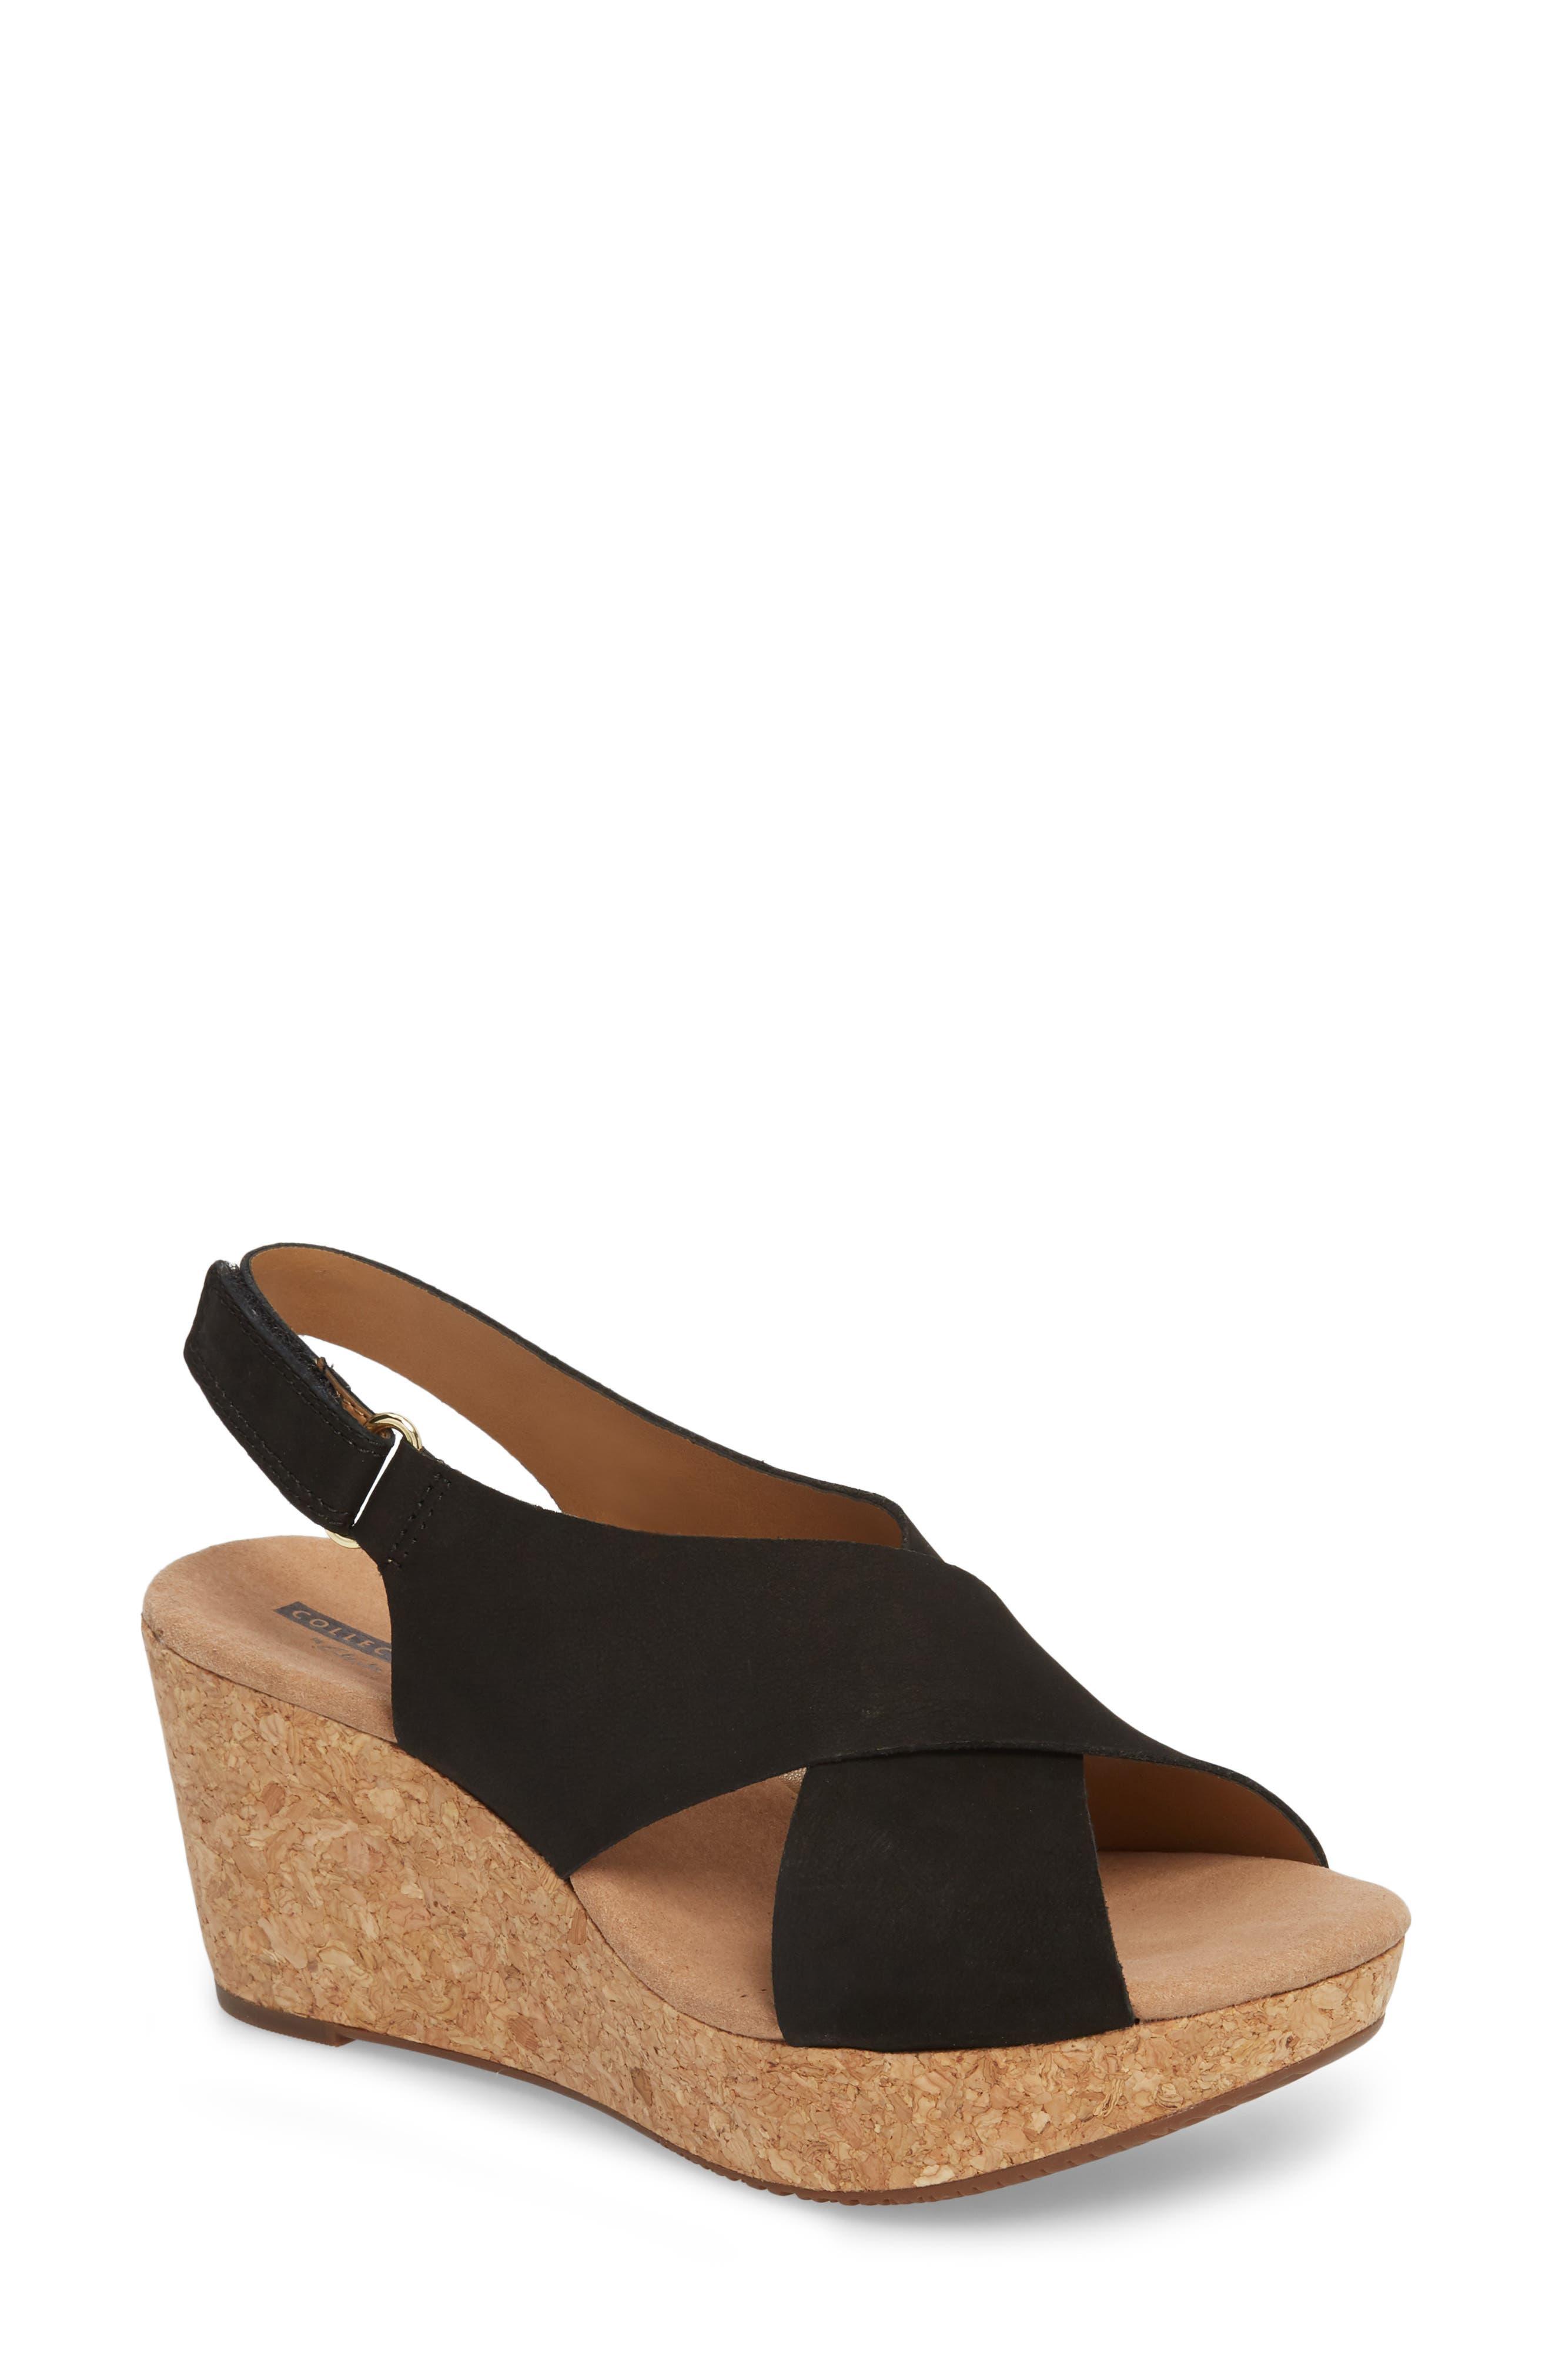 Annadel Eirwyn Wedge Sandal,                         Main,                         color, Black Nubuck